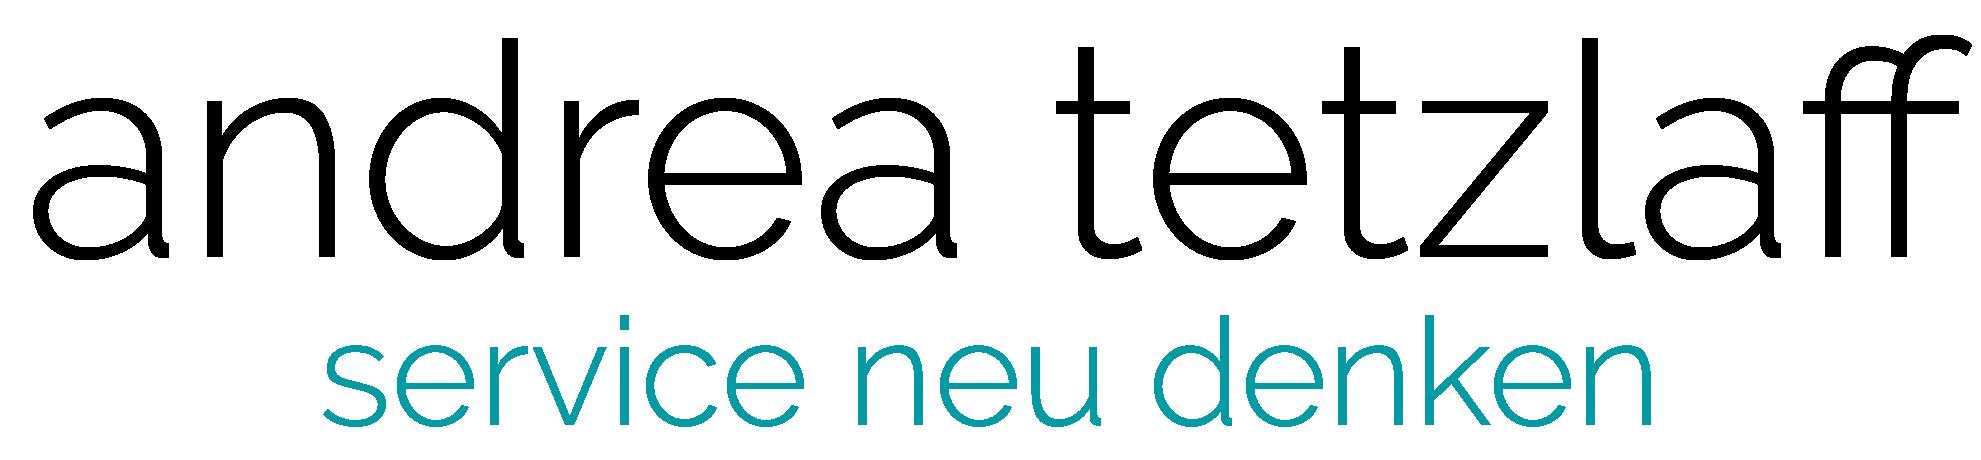 Andrea-Tetzlaff-Service-Neu-Denken-Logo-farbig